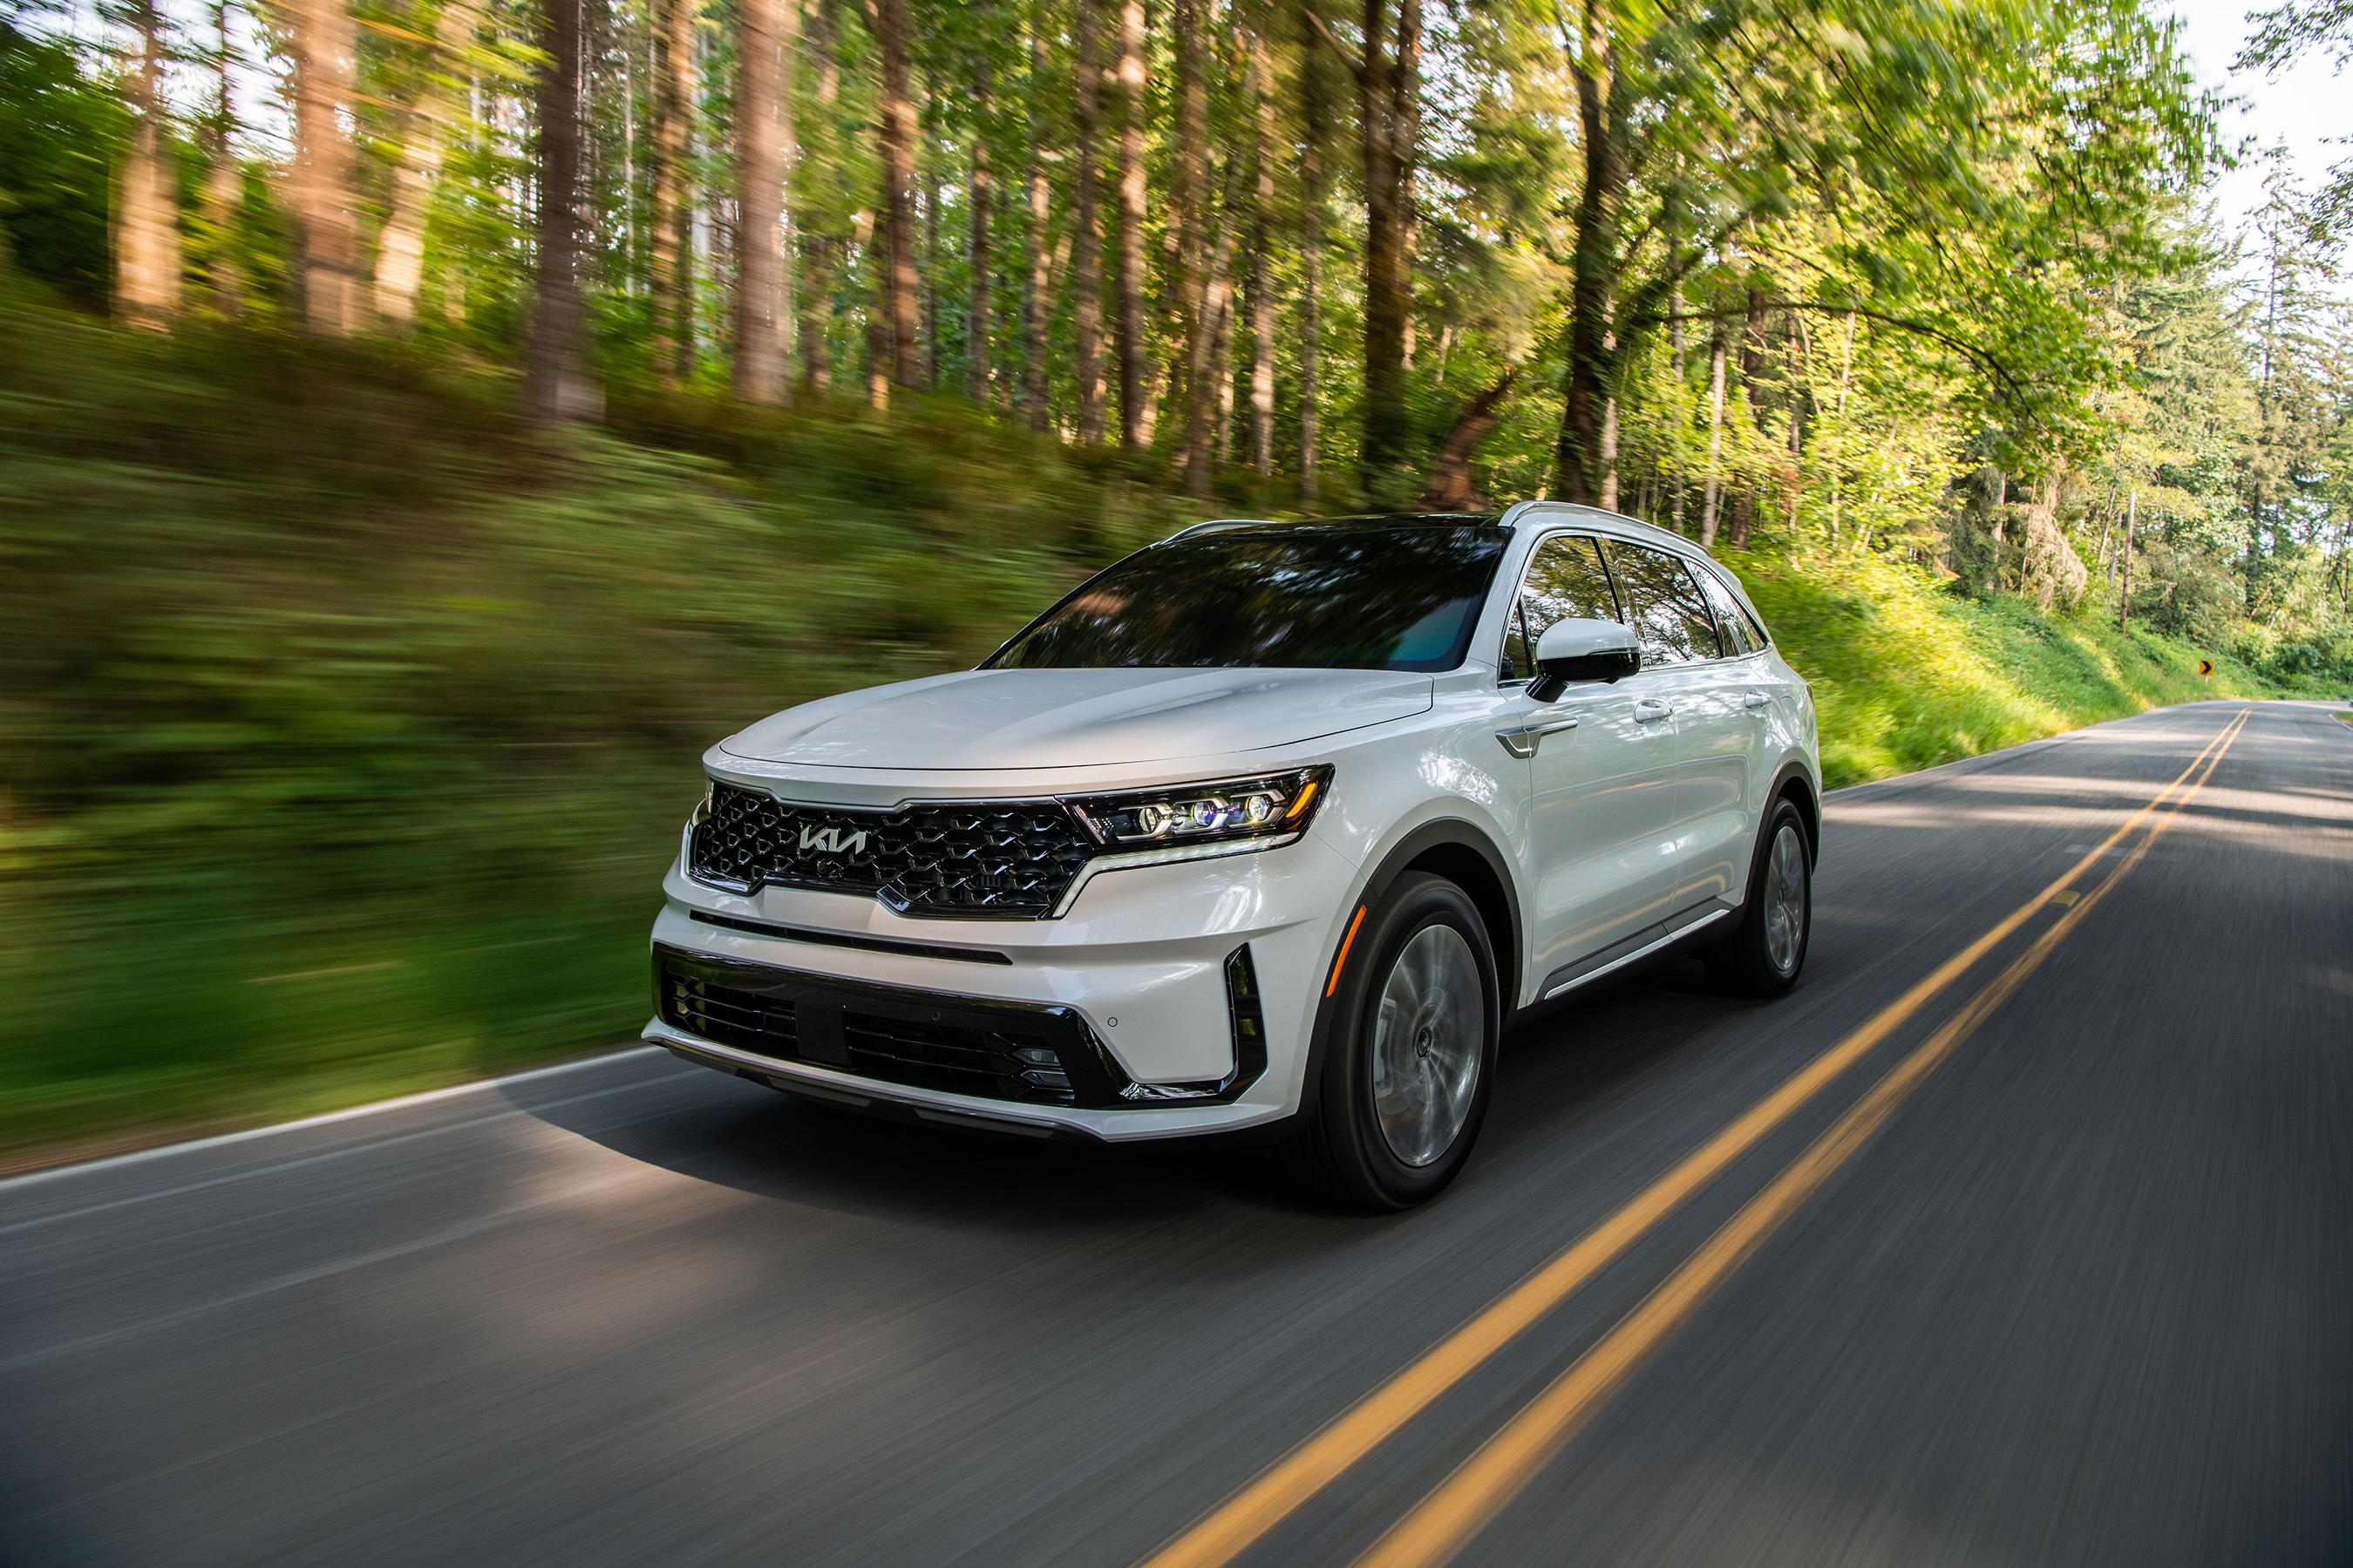 New 2022 Kia Sorento PHEV joins popular SUV model range.